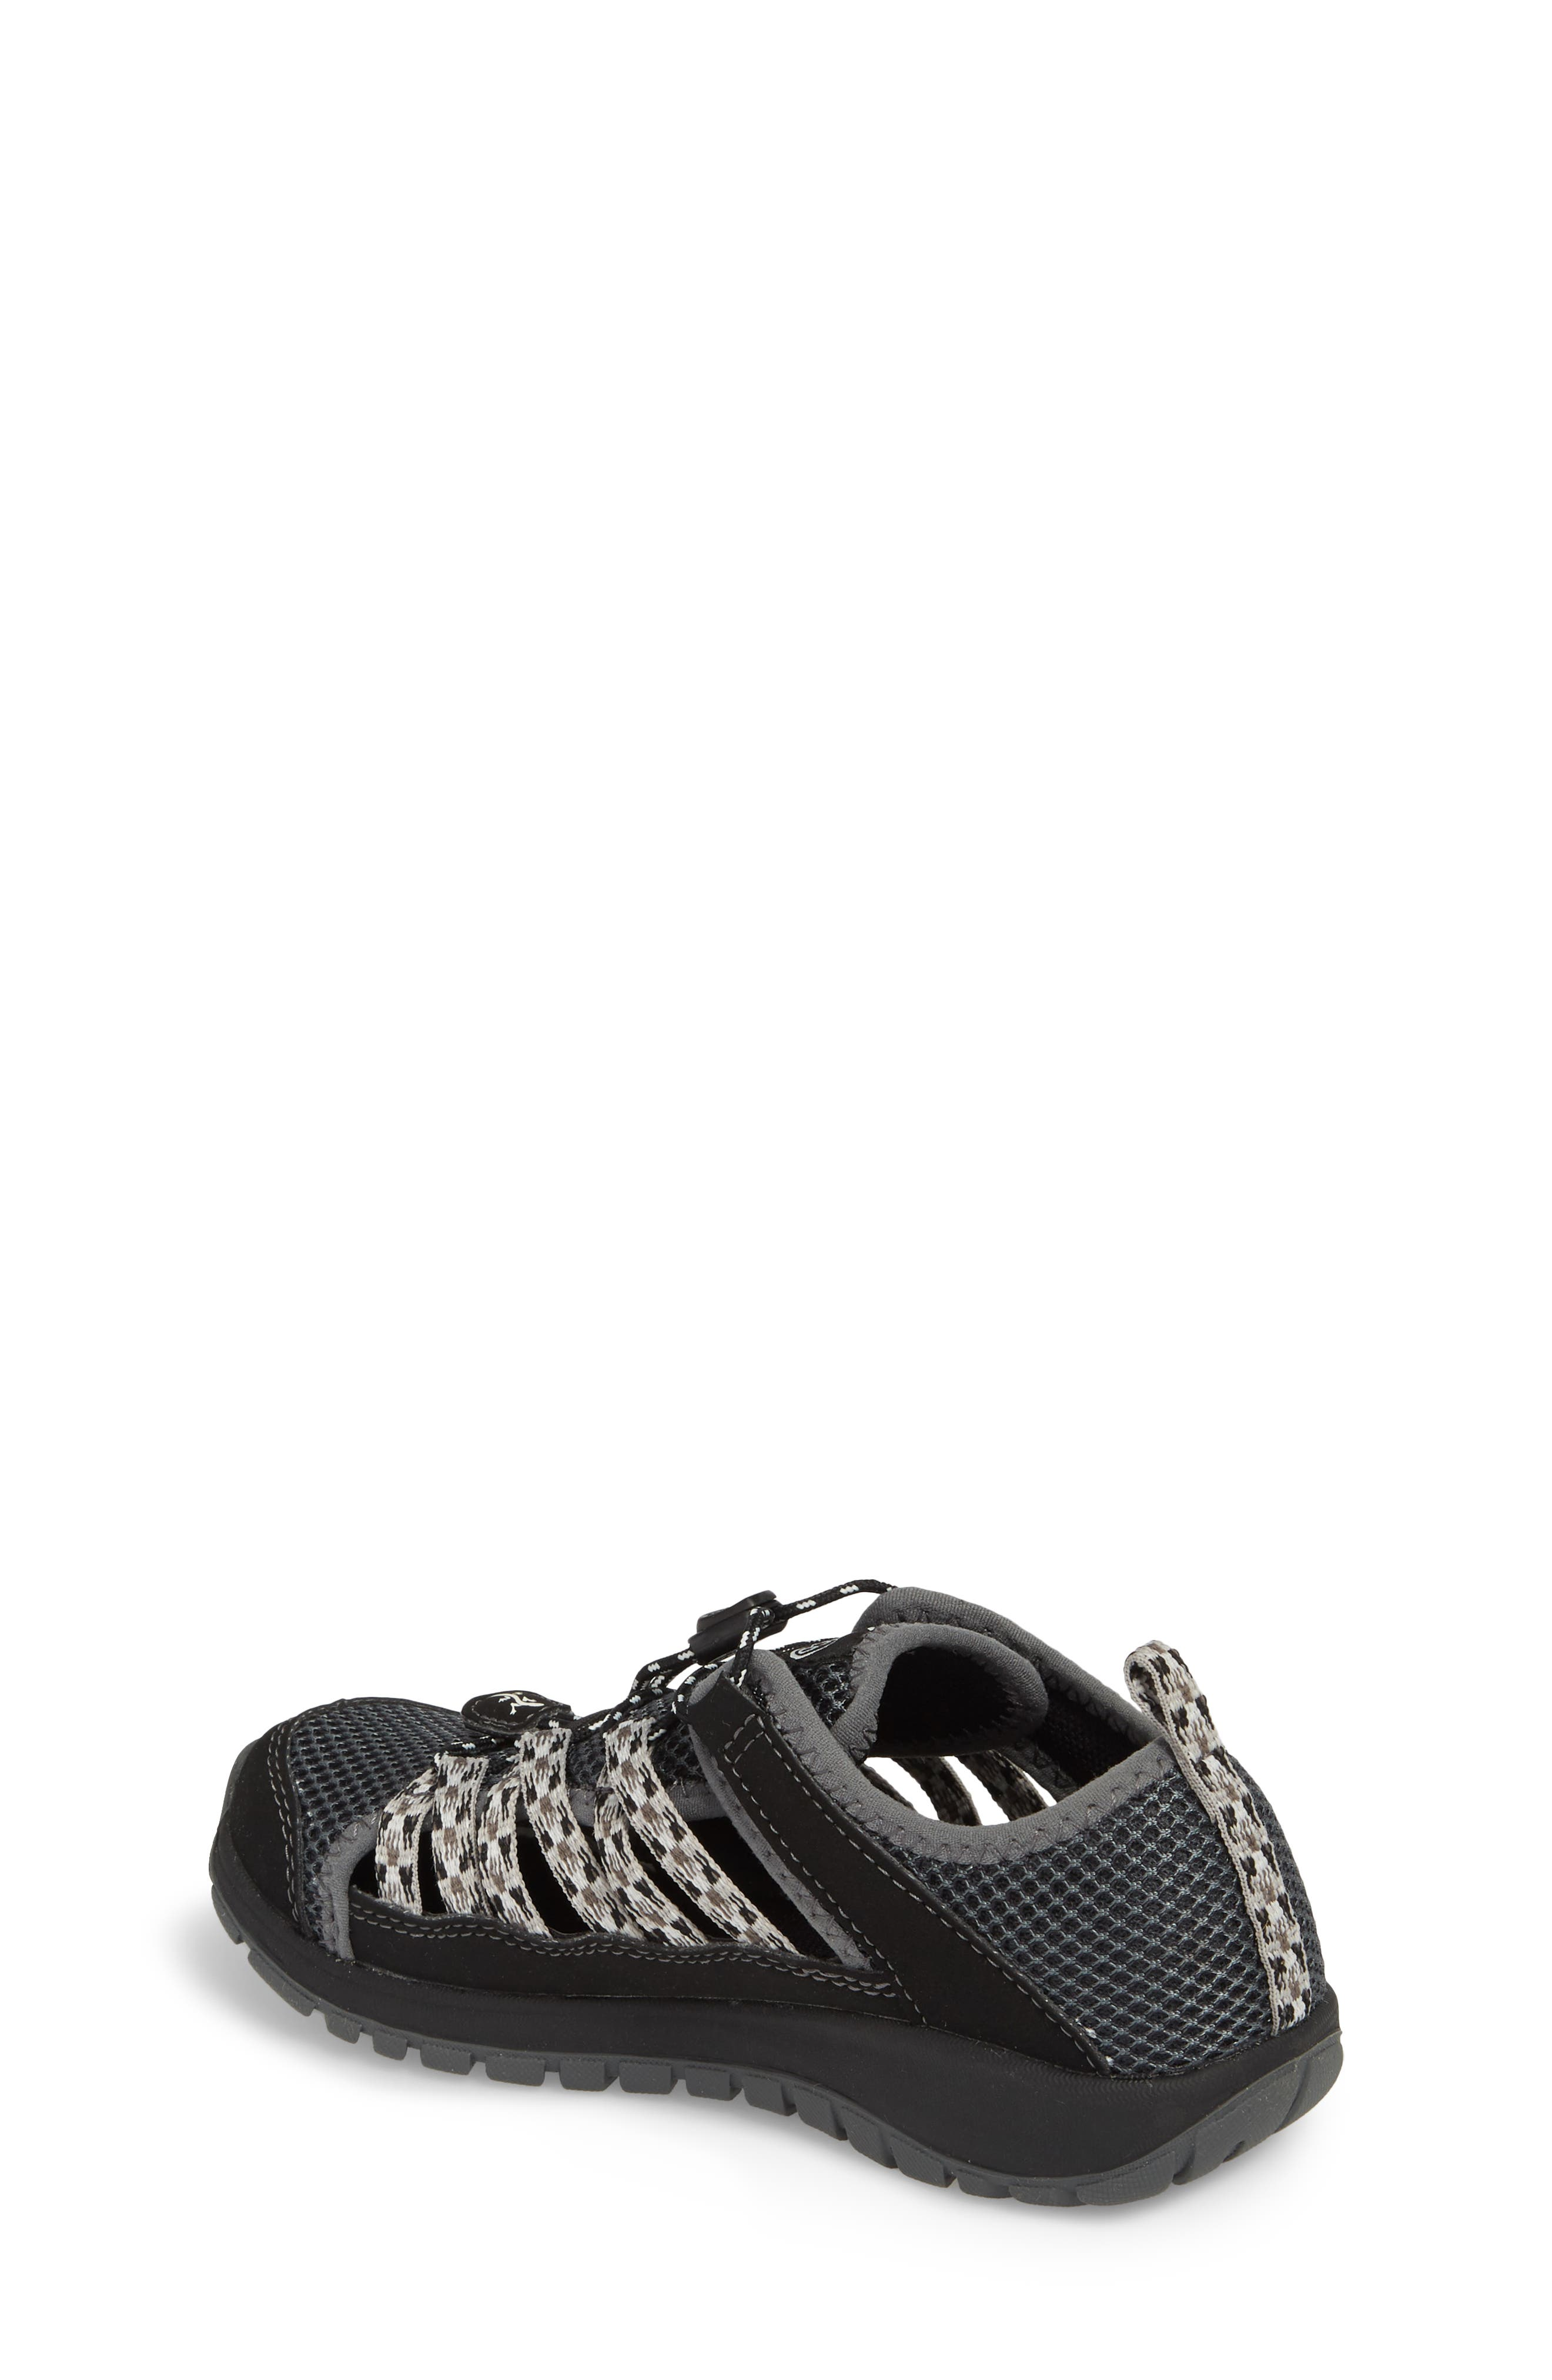 Outcross 2 Water Sneaker,                             Alternate thumbnail 2, color,                             BLACK